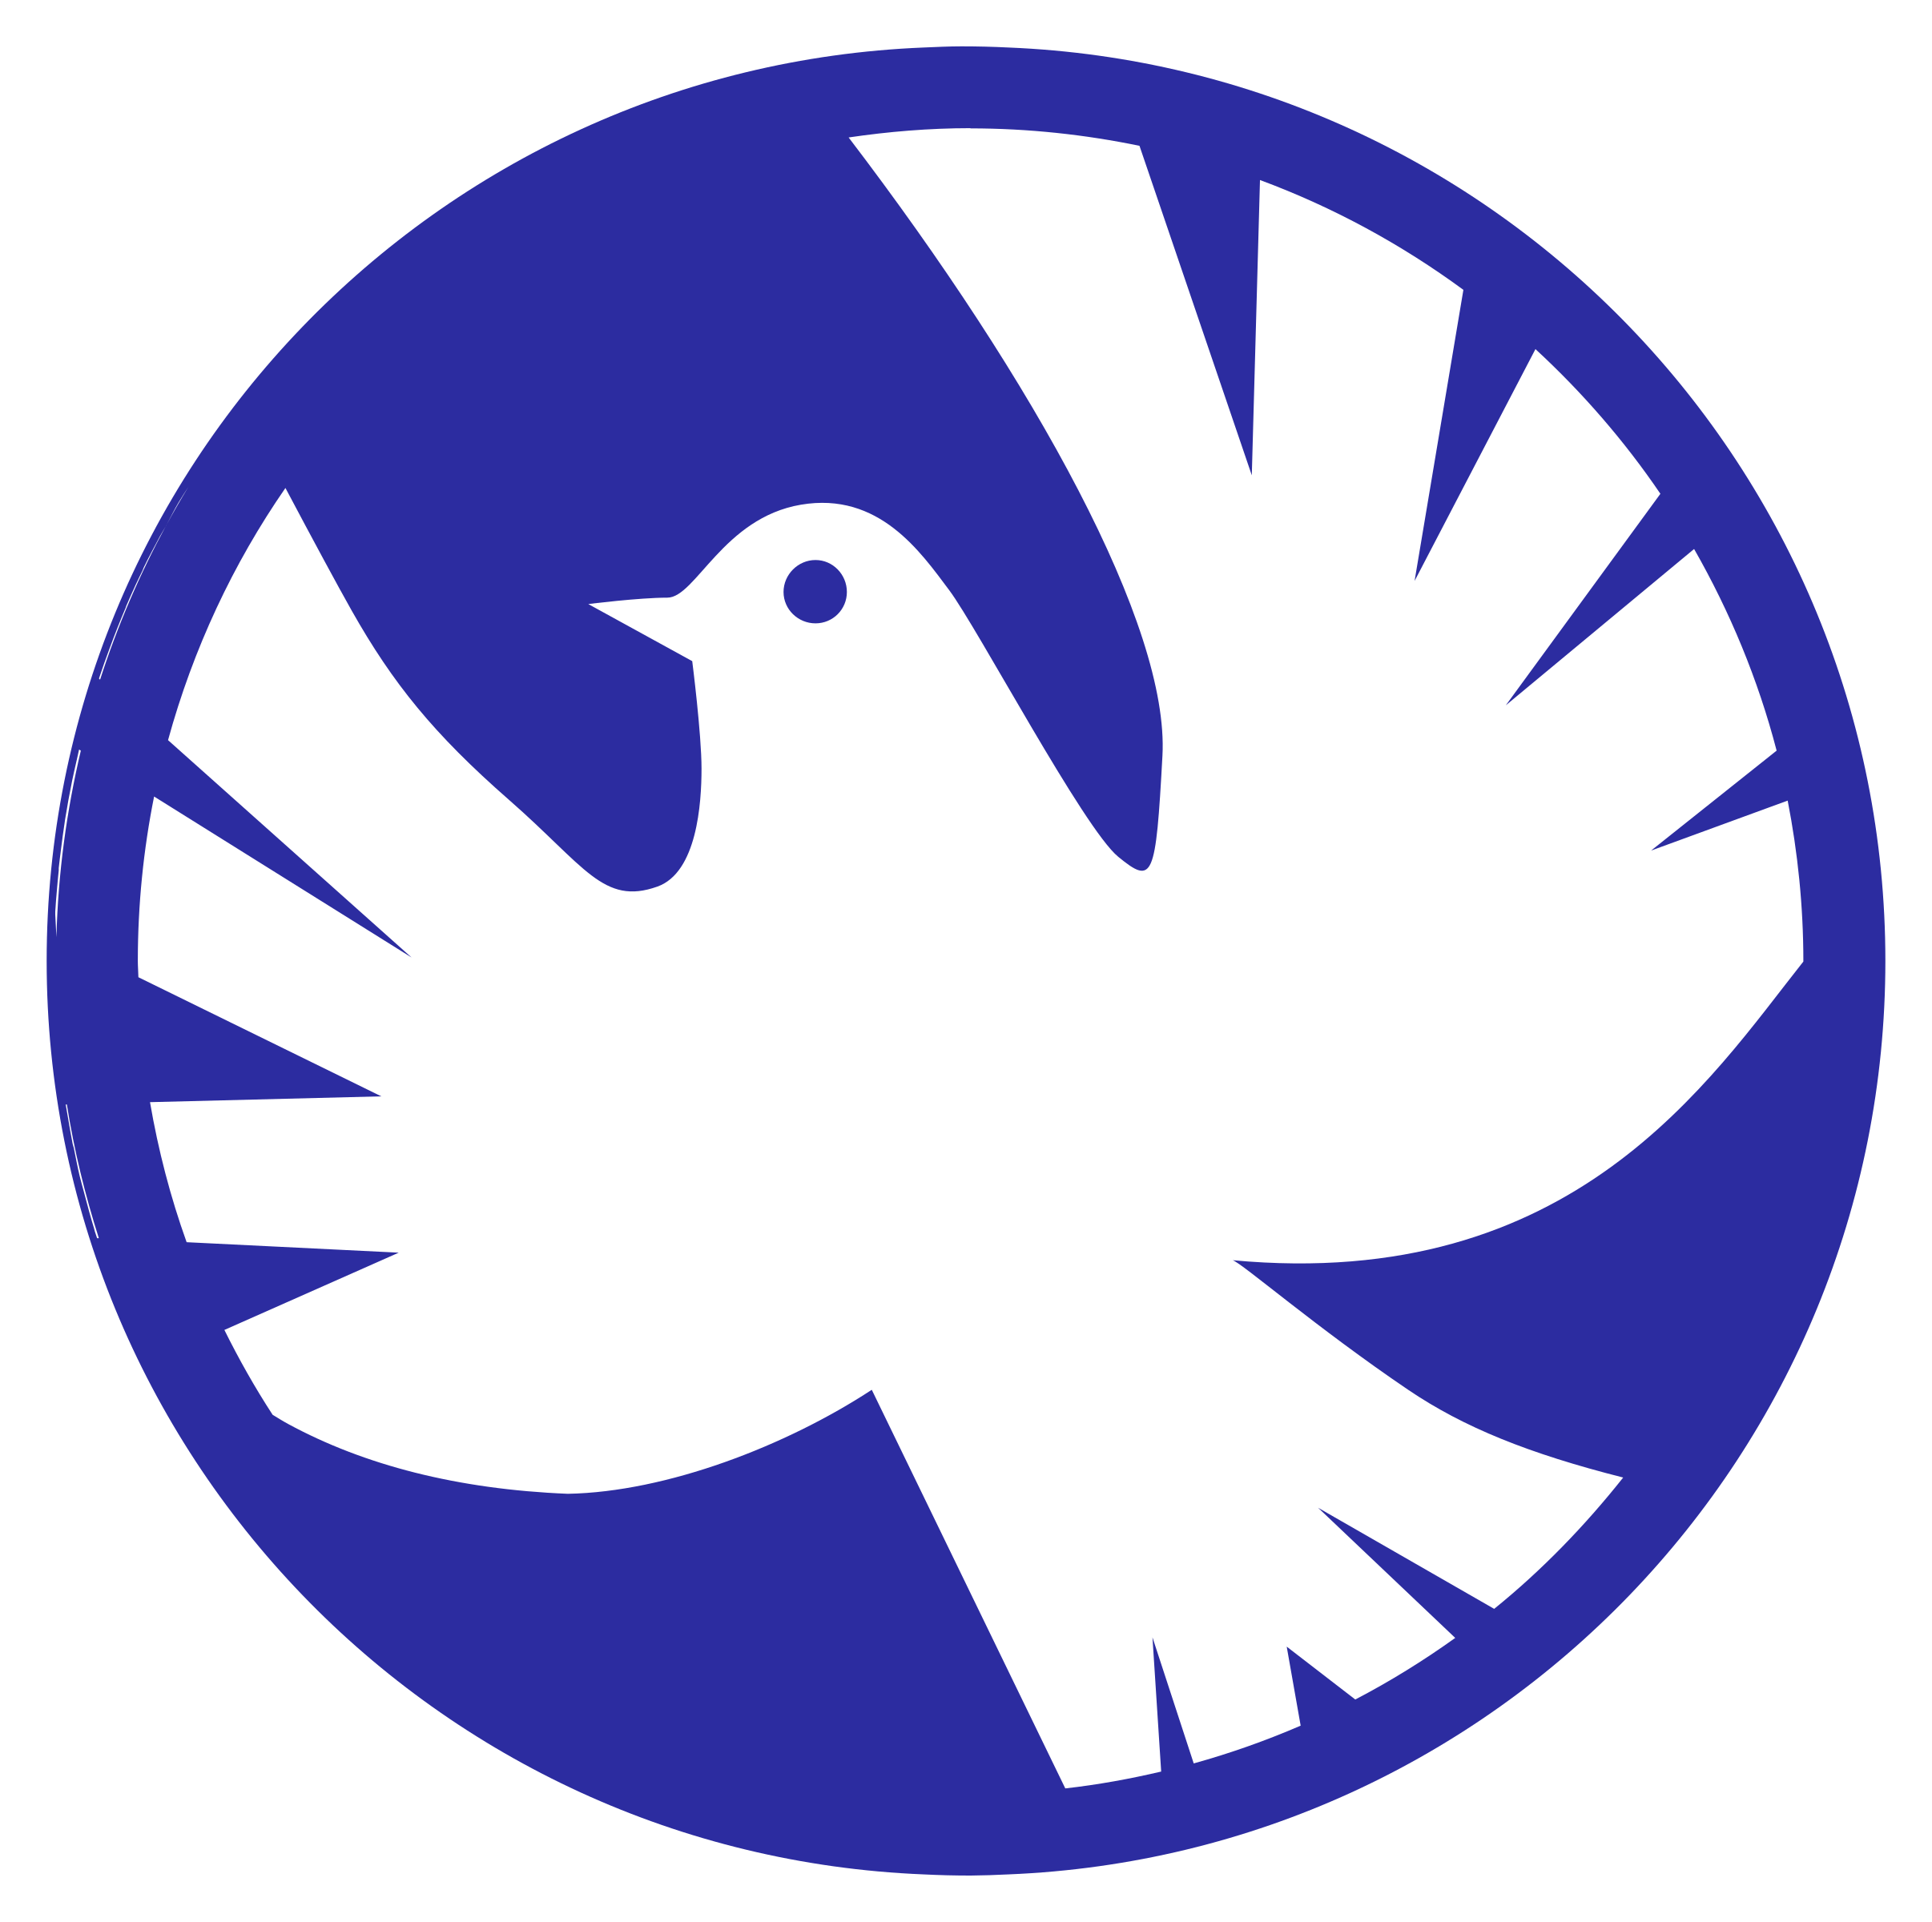 Dove big image png. Peace clipart peace harmony